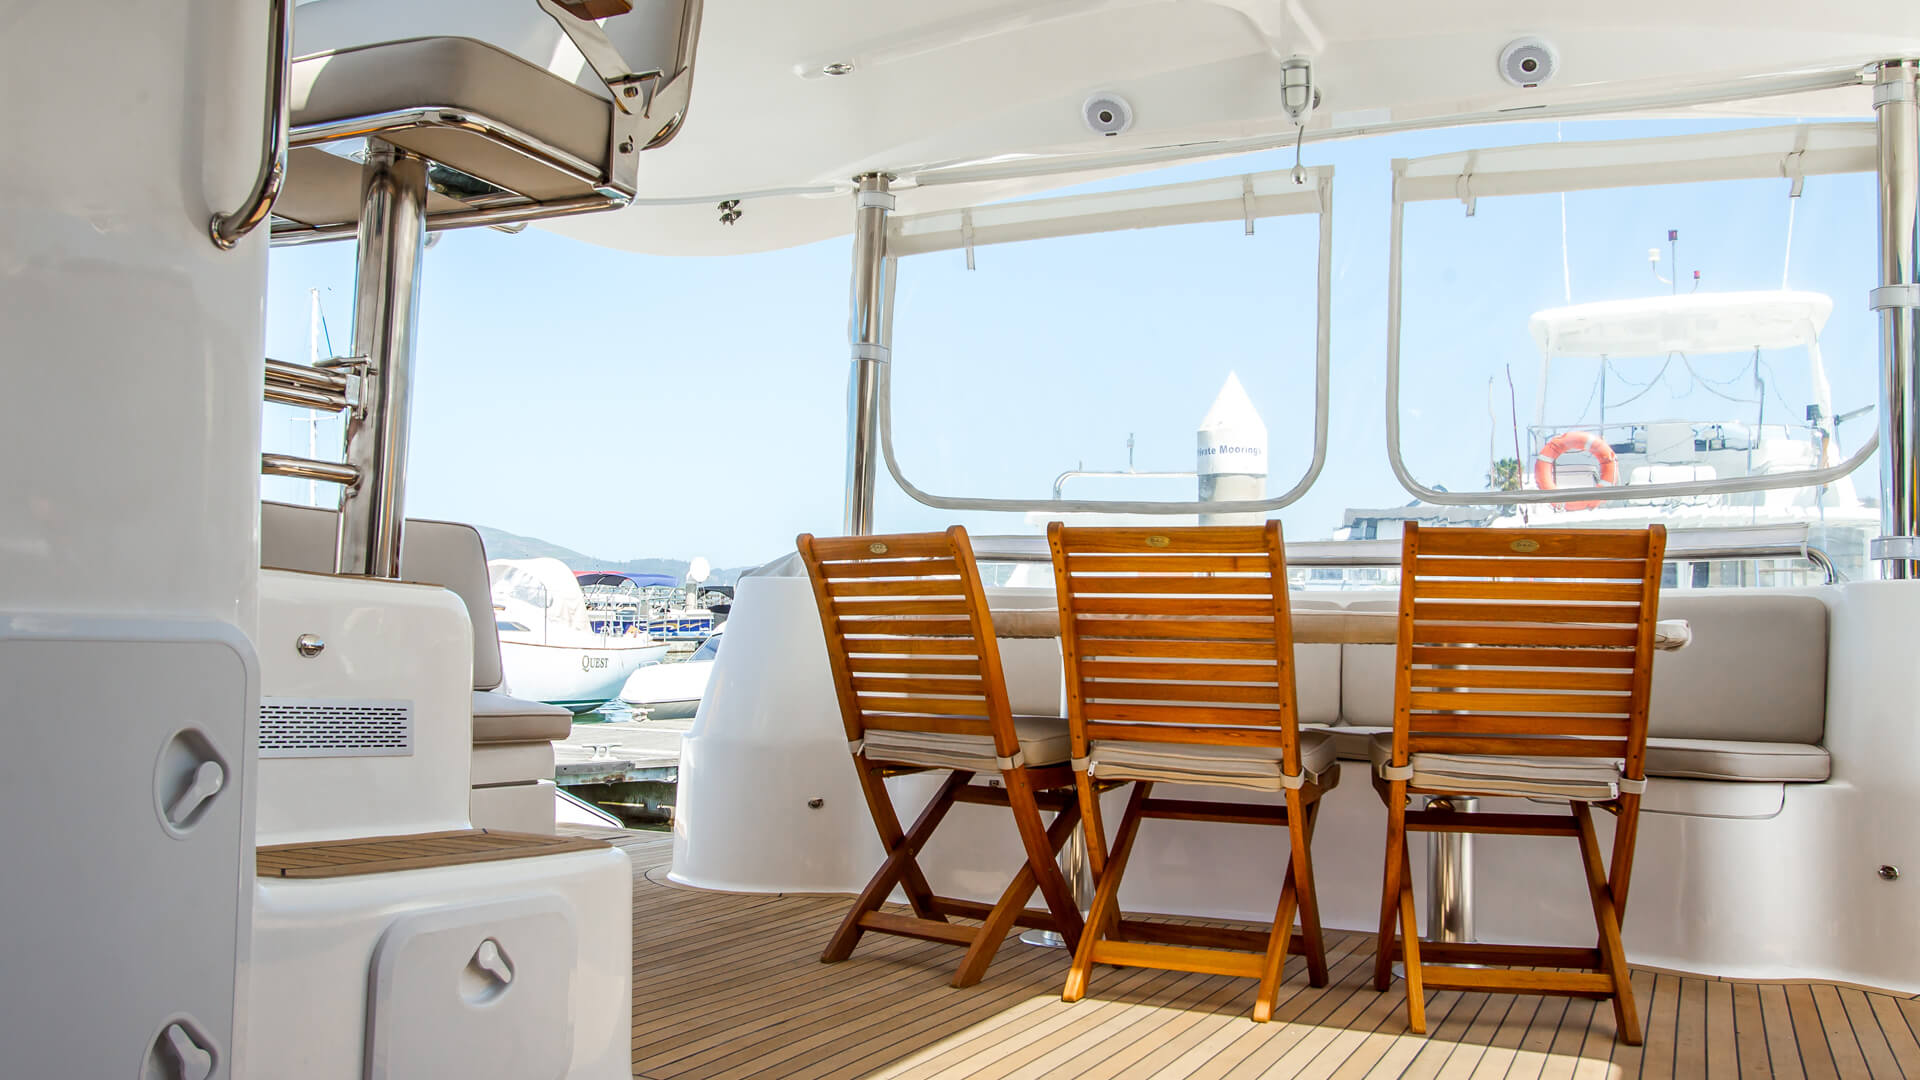 Seats on a knysna 500 yacht